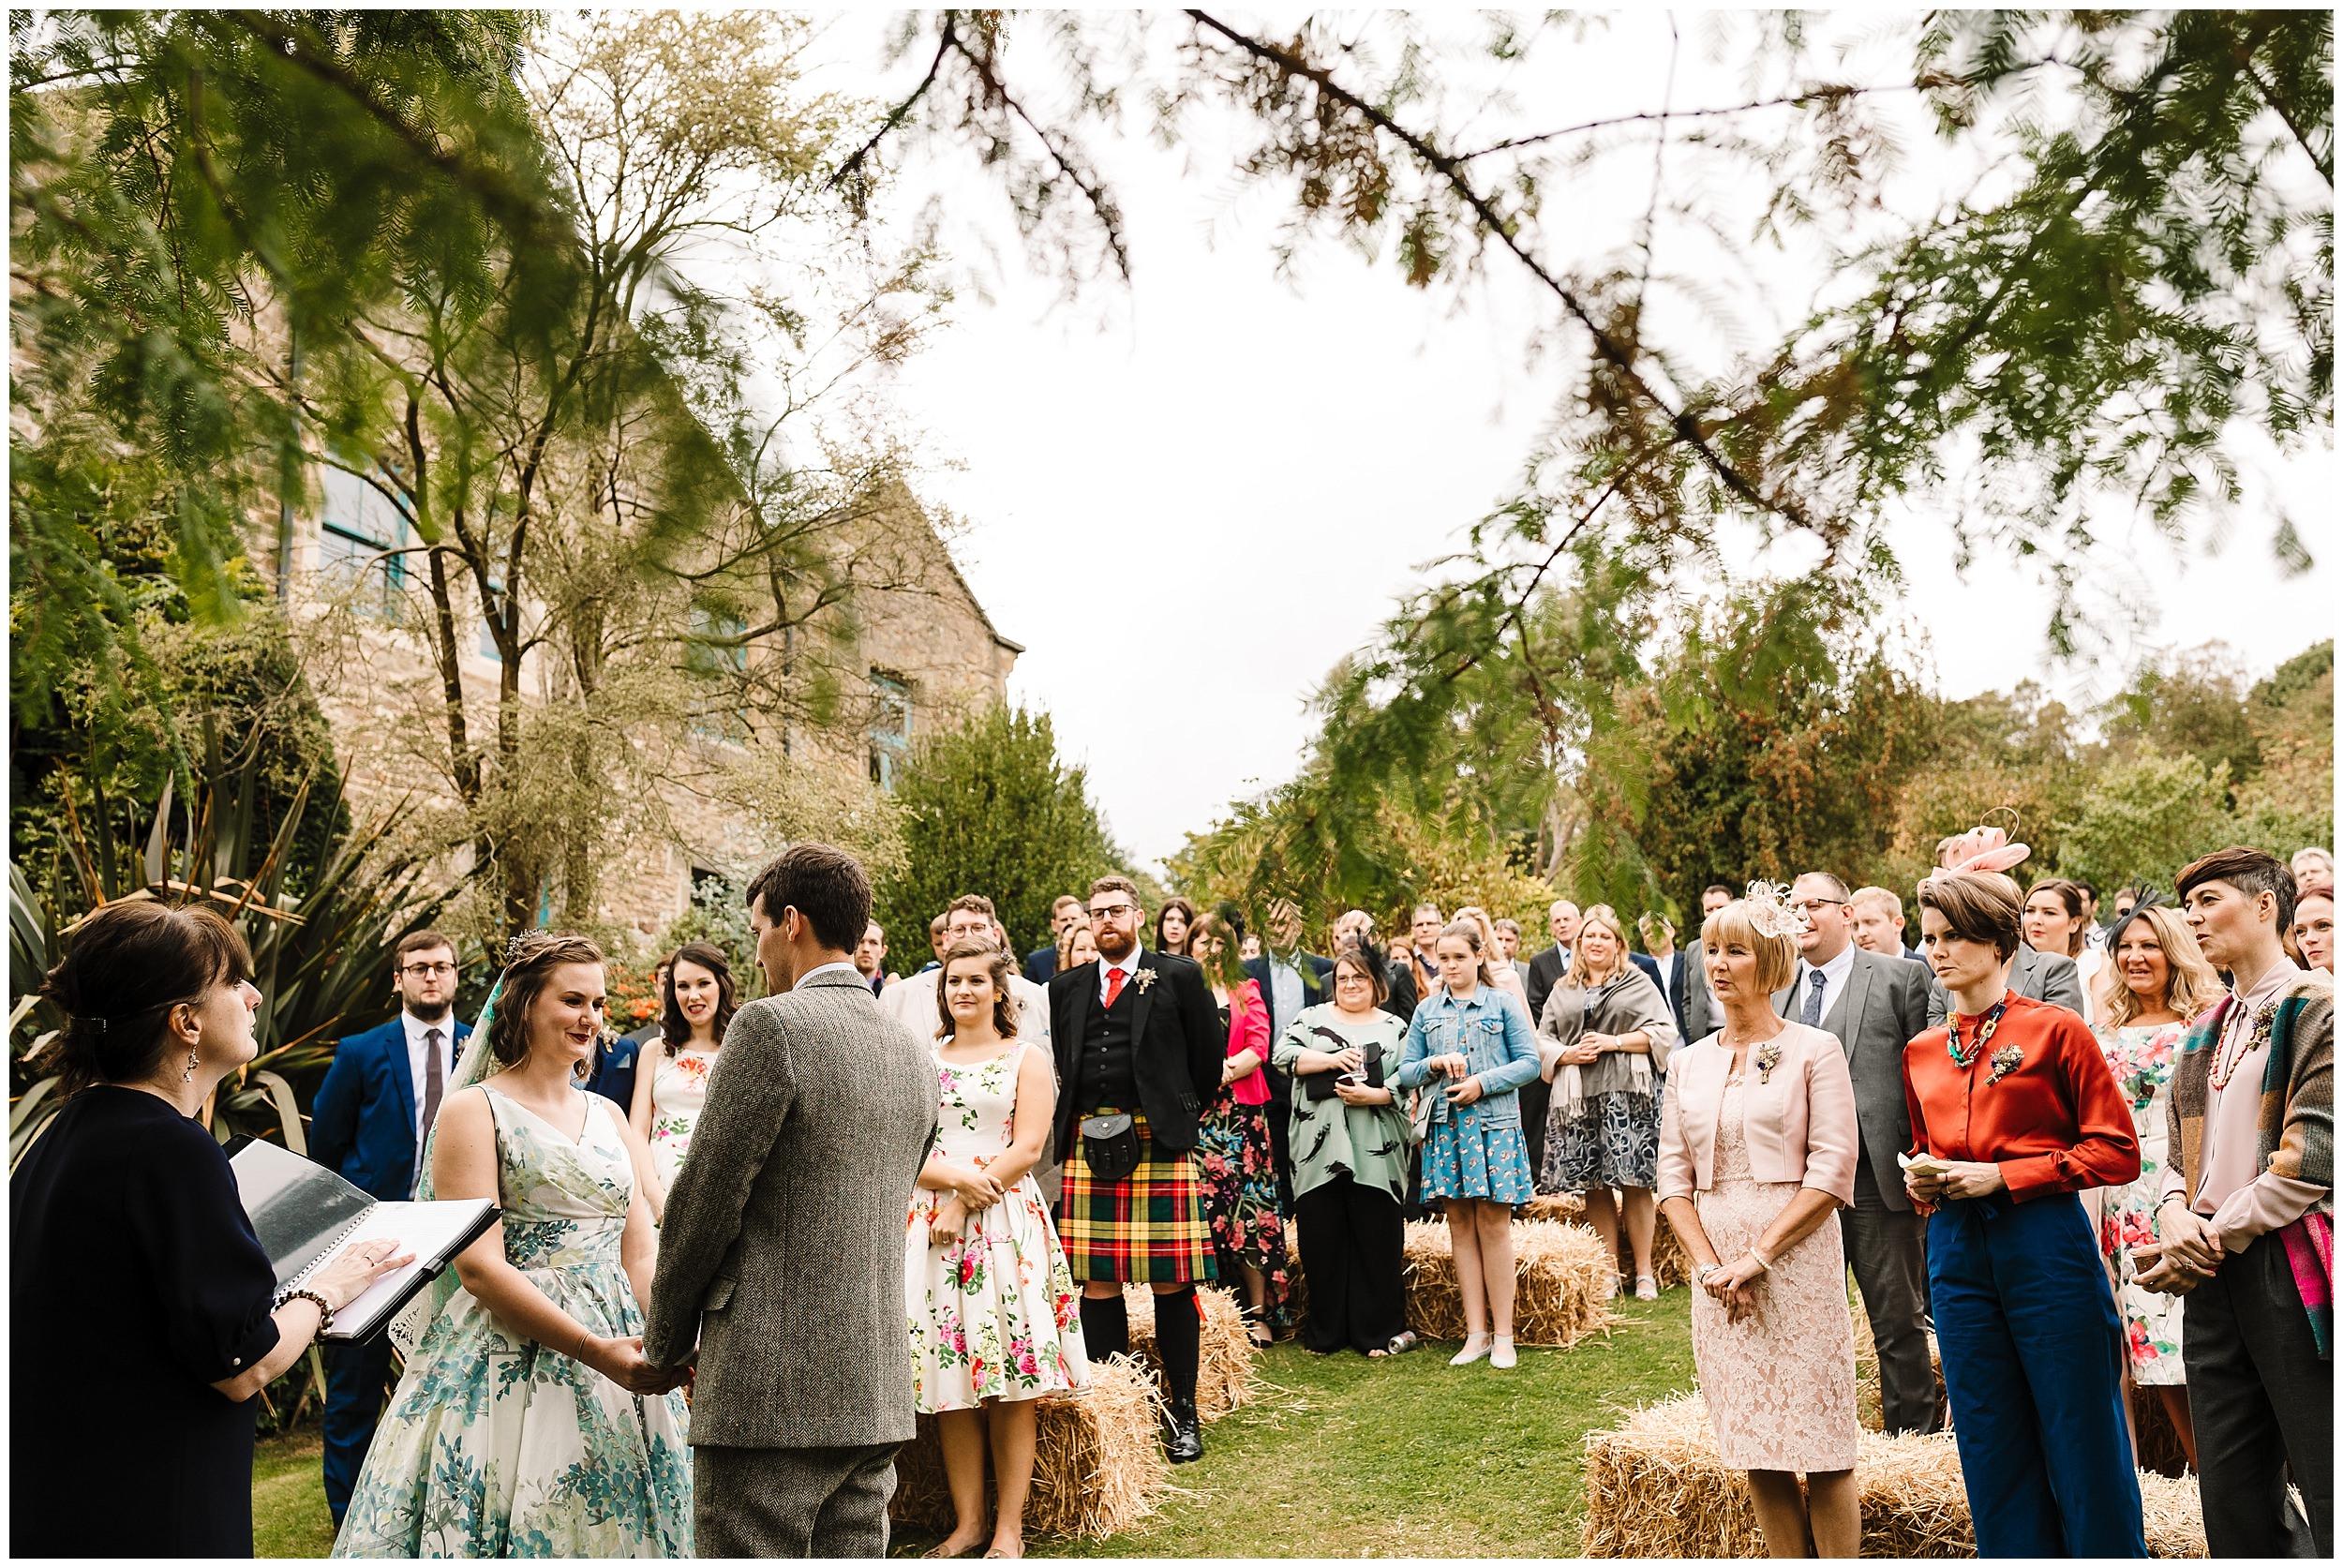 YORKSHIRE OUTDOOR WEDDING PHOTOGRAPHER LUCY ALEX_0016.jpg